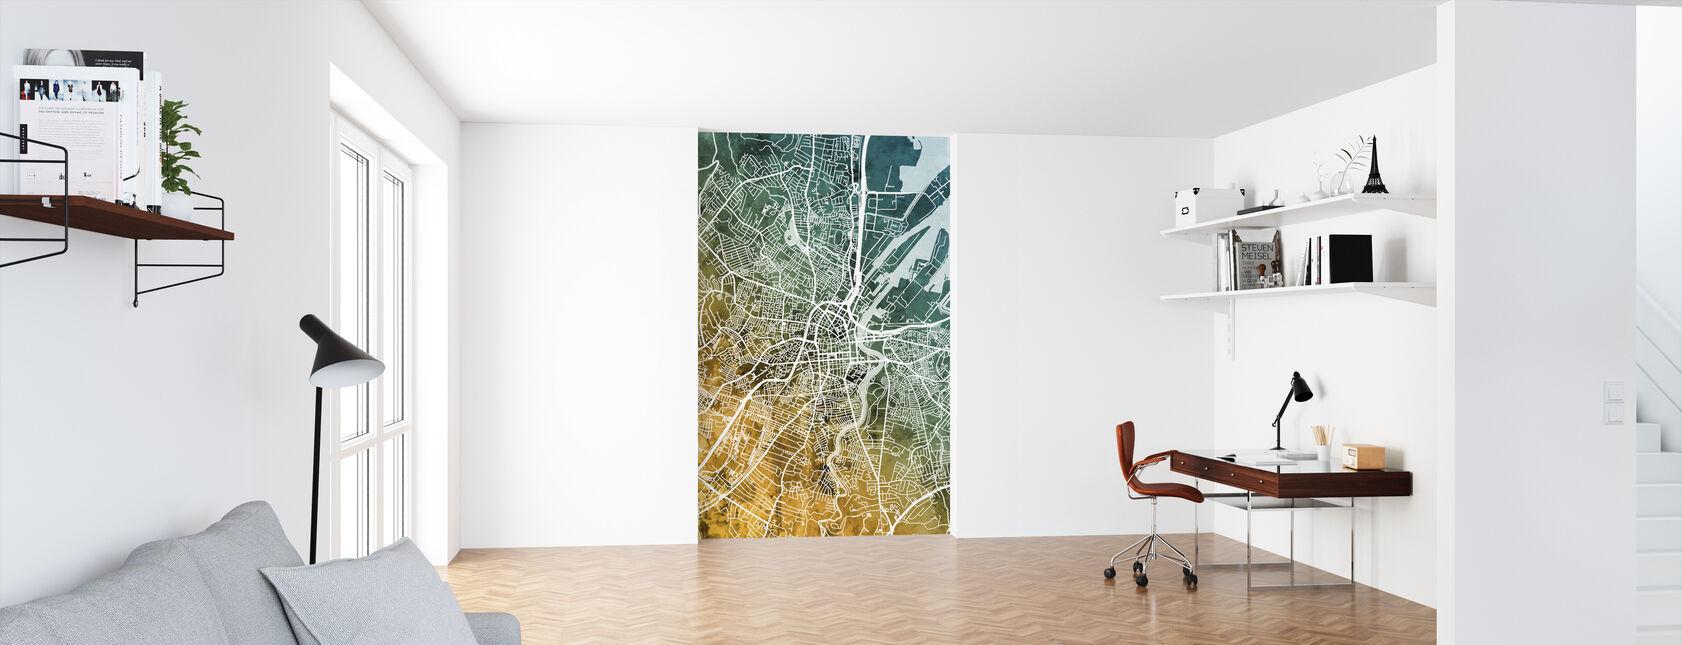 Belfast Northern Ireland City Map - Wallpaper - Office